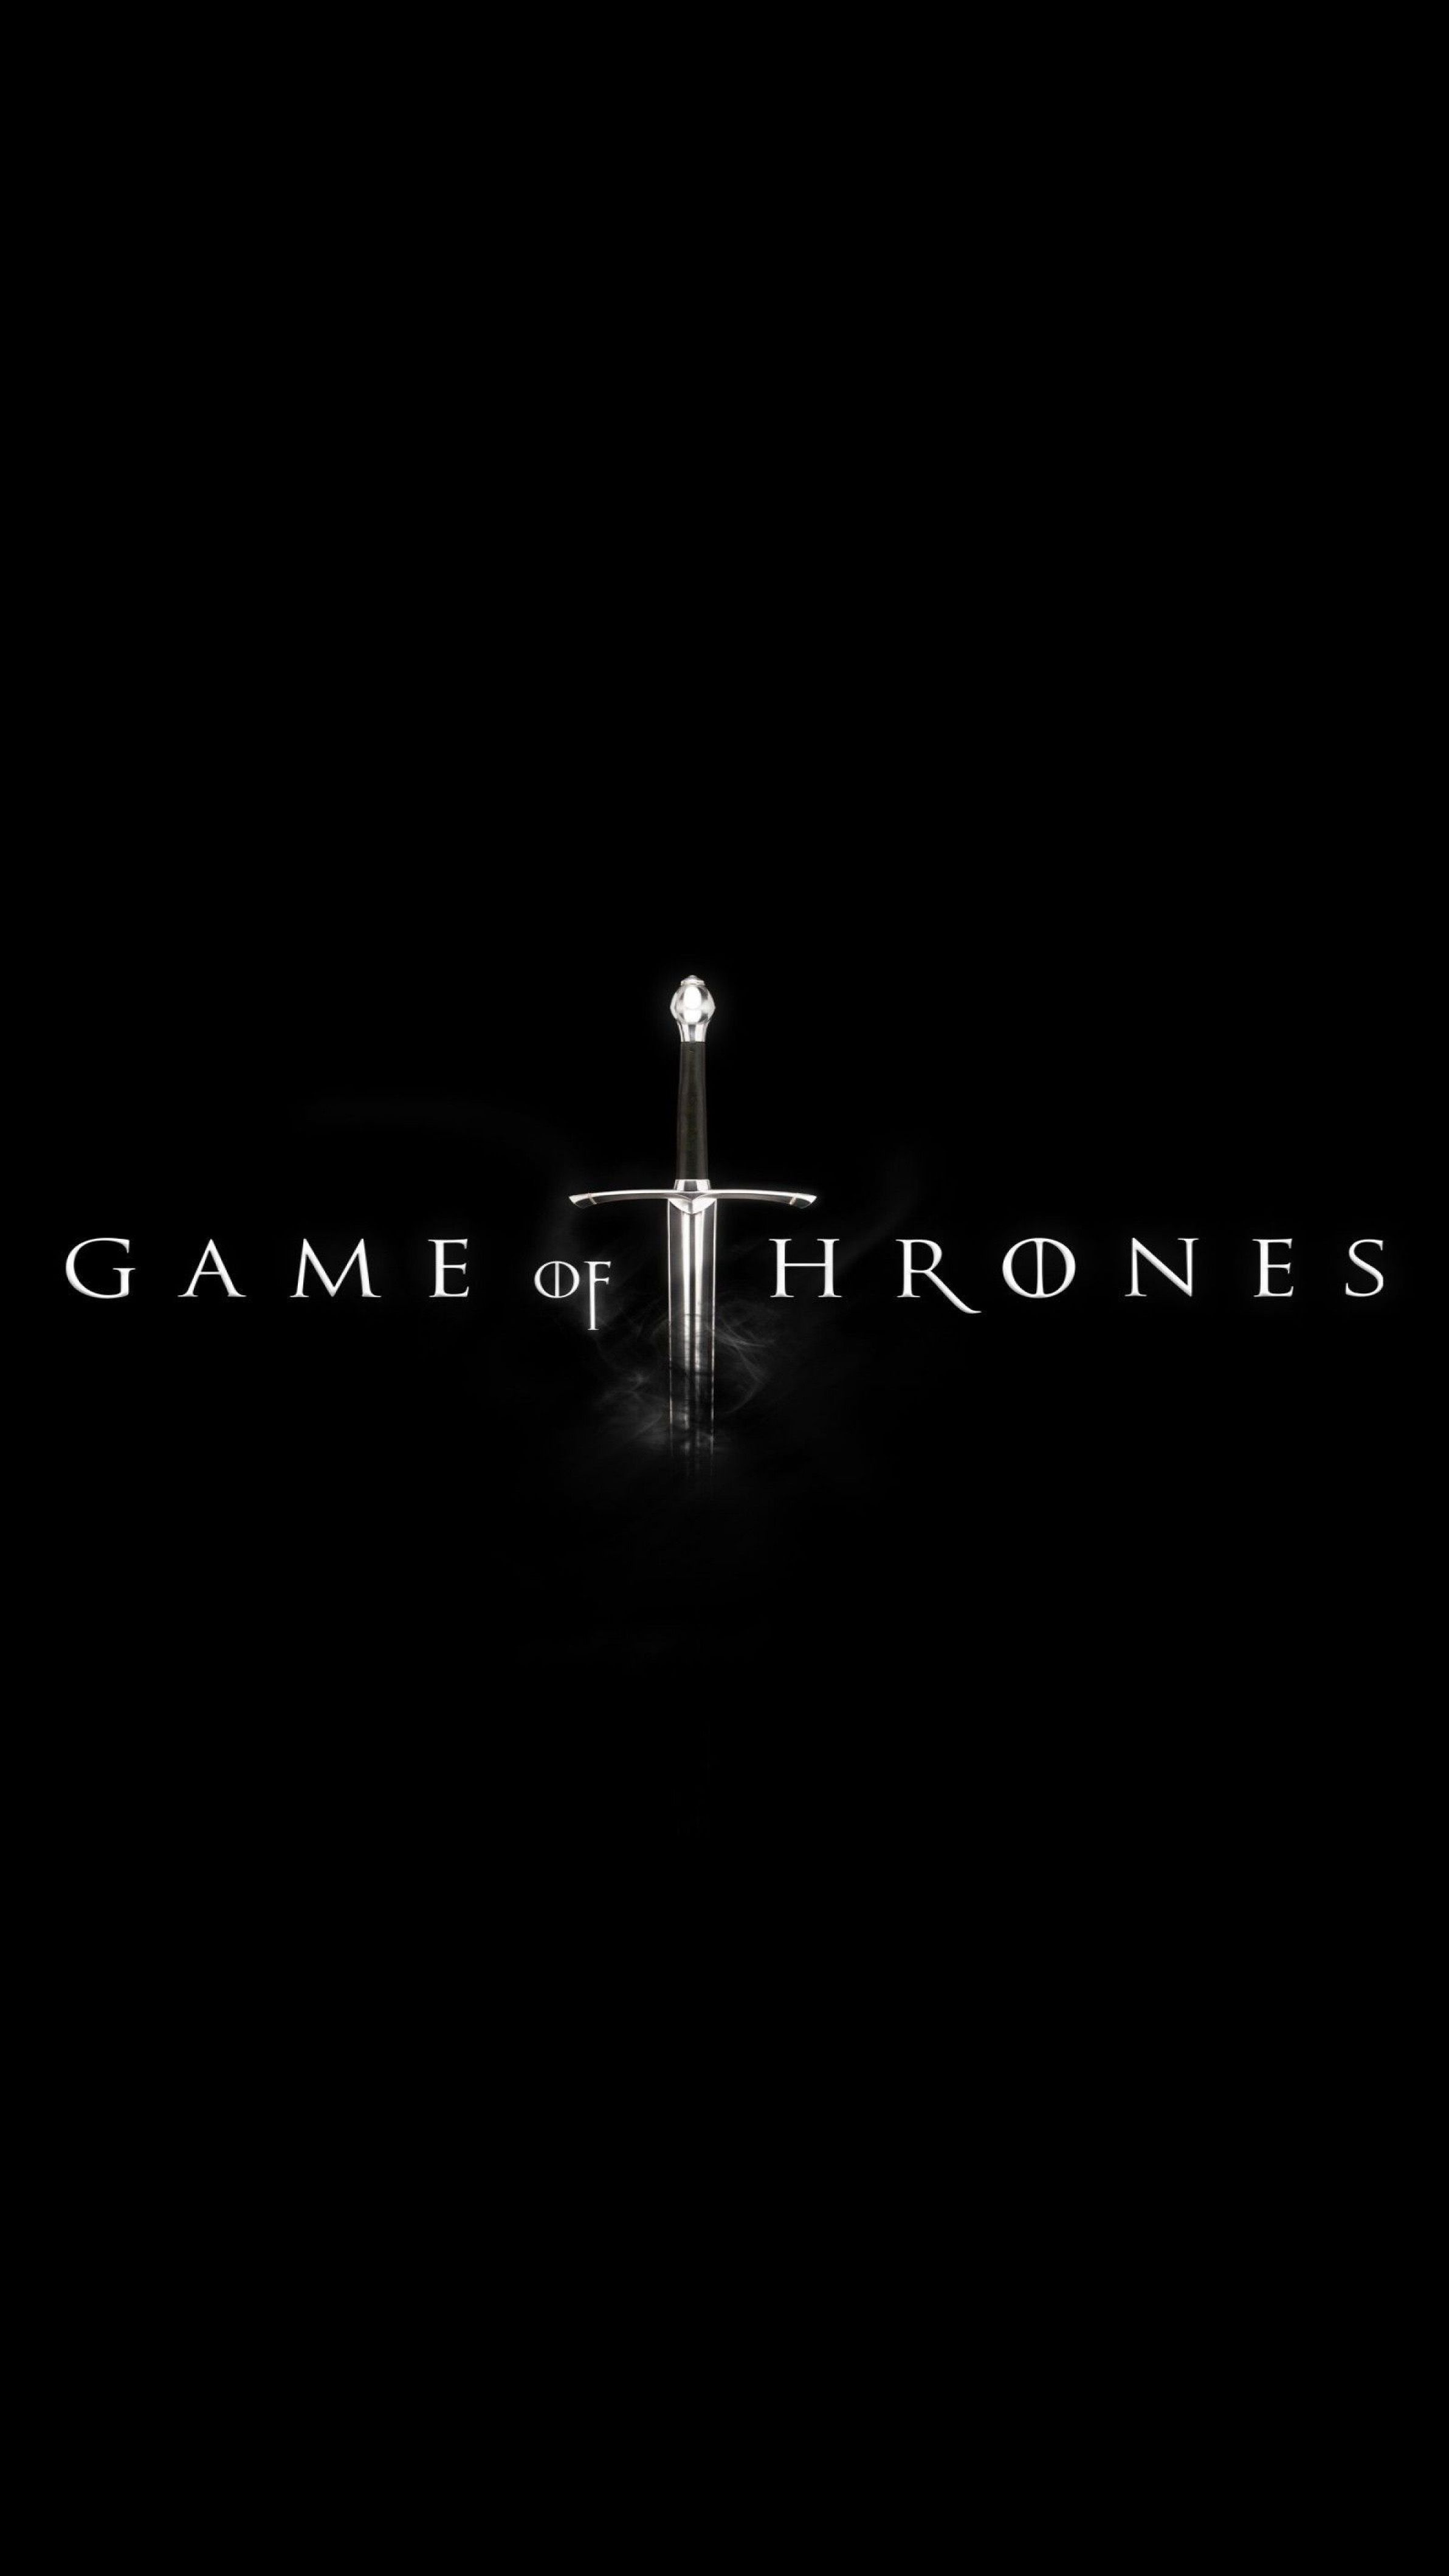 Game Of Thrones Sword Best Htc One Wallpapers Game Of Thrones Sword Game Of Thrones Winter Hd Phone Wallpapers